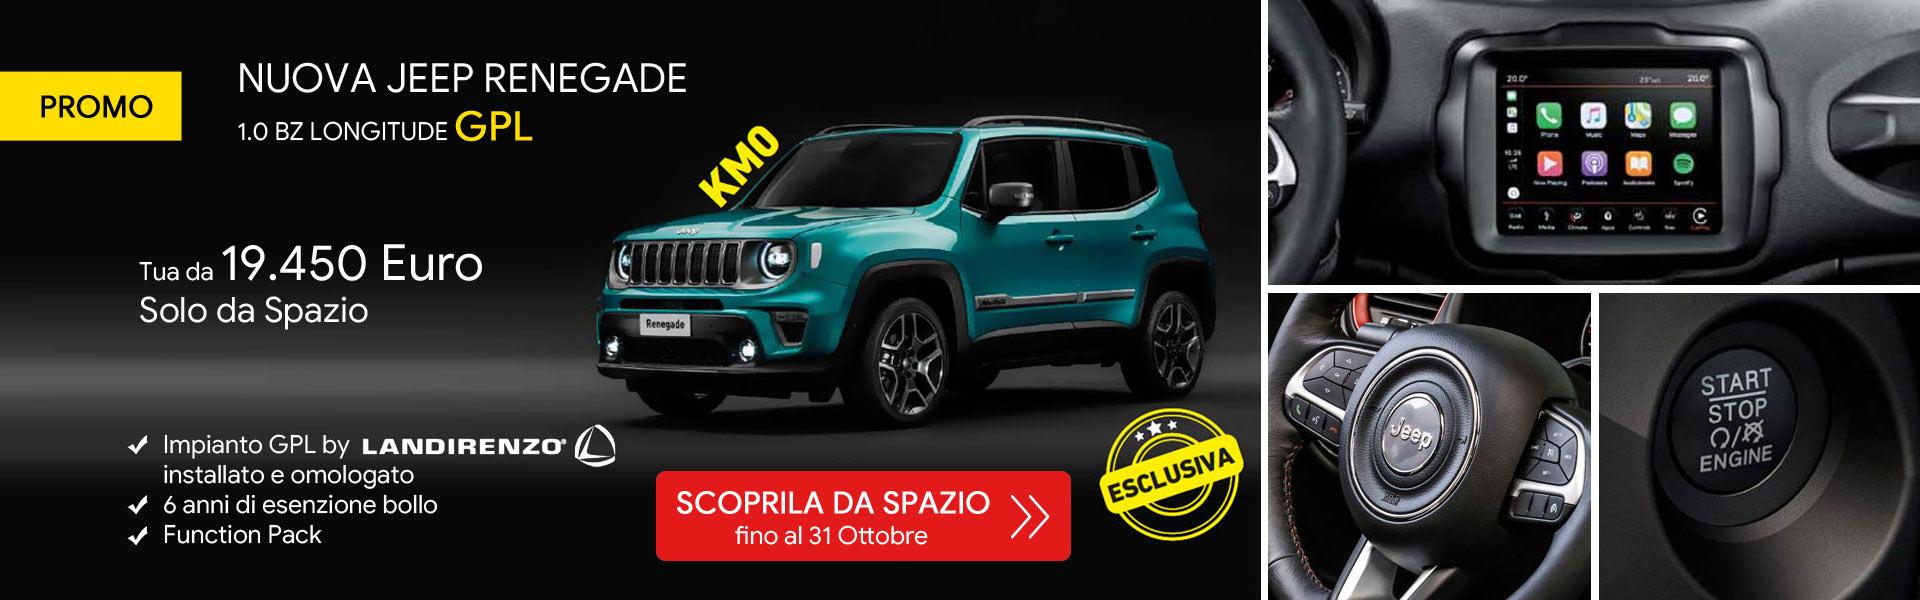 Jeep Renegade Promo